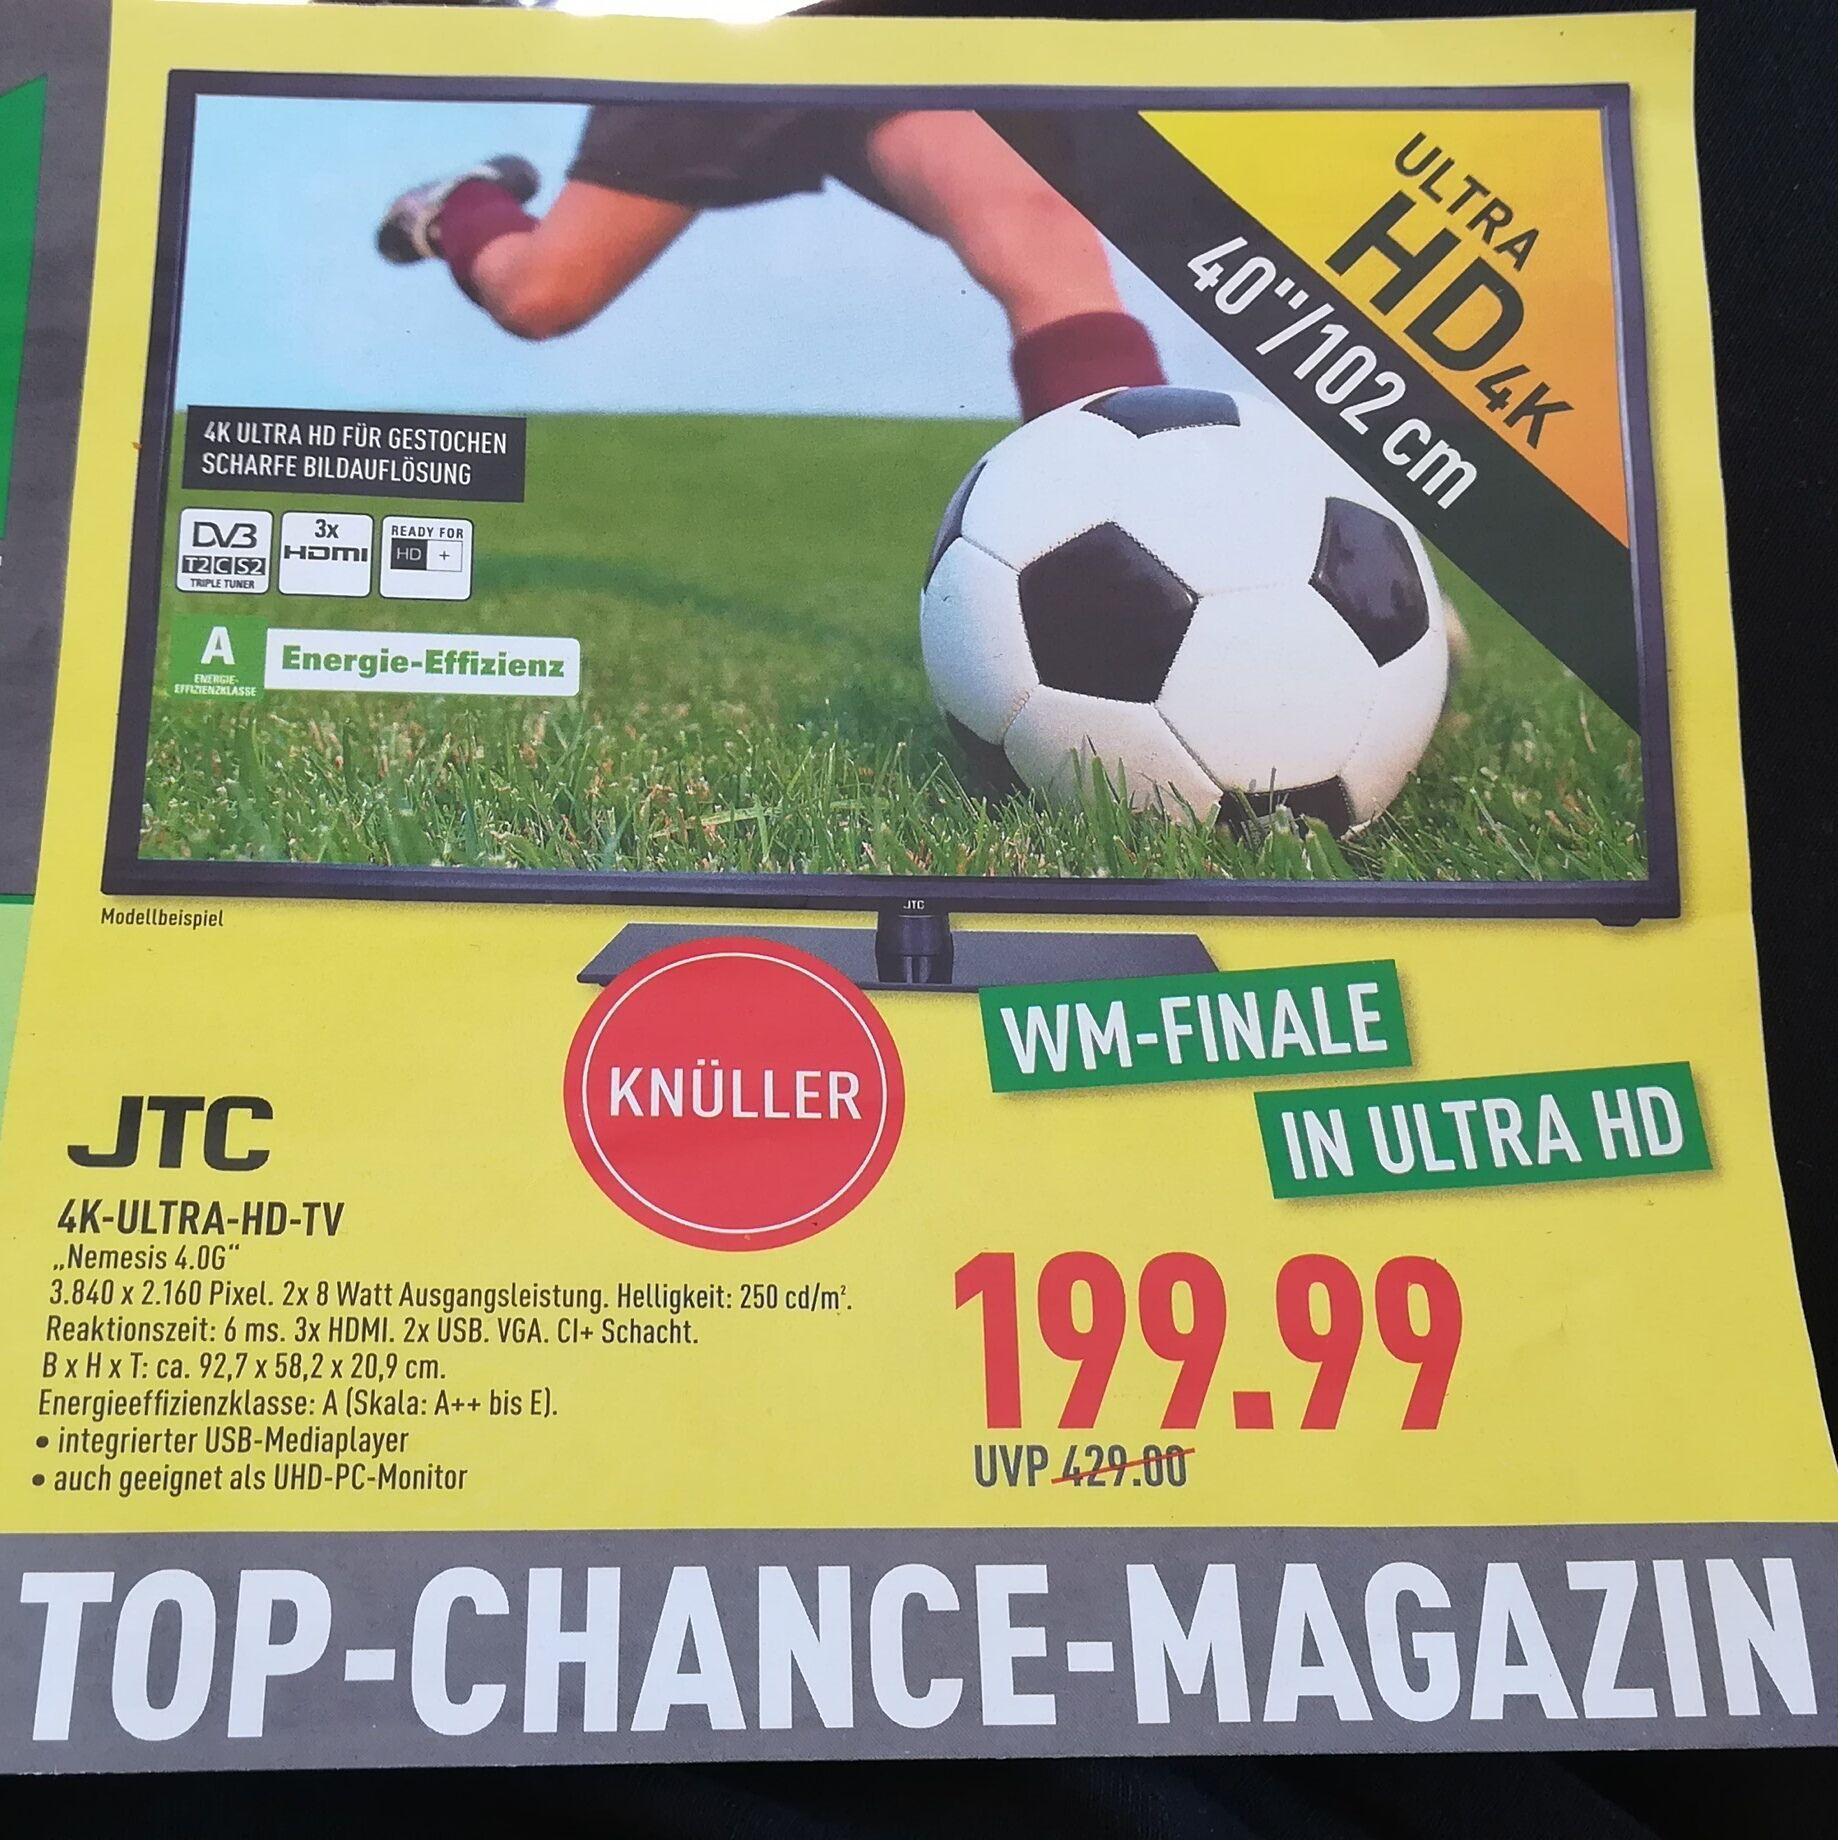 "JTC Nemesis 4.0G TV mit Triple Tuner (4K / 40"" / DVB-T2) @Marktkauf Iserlohn-Wermingsen"